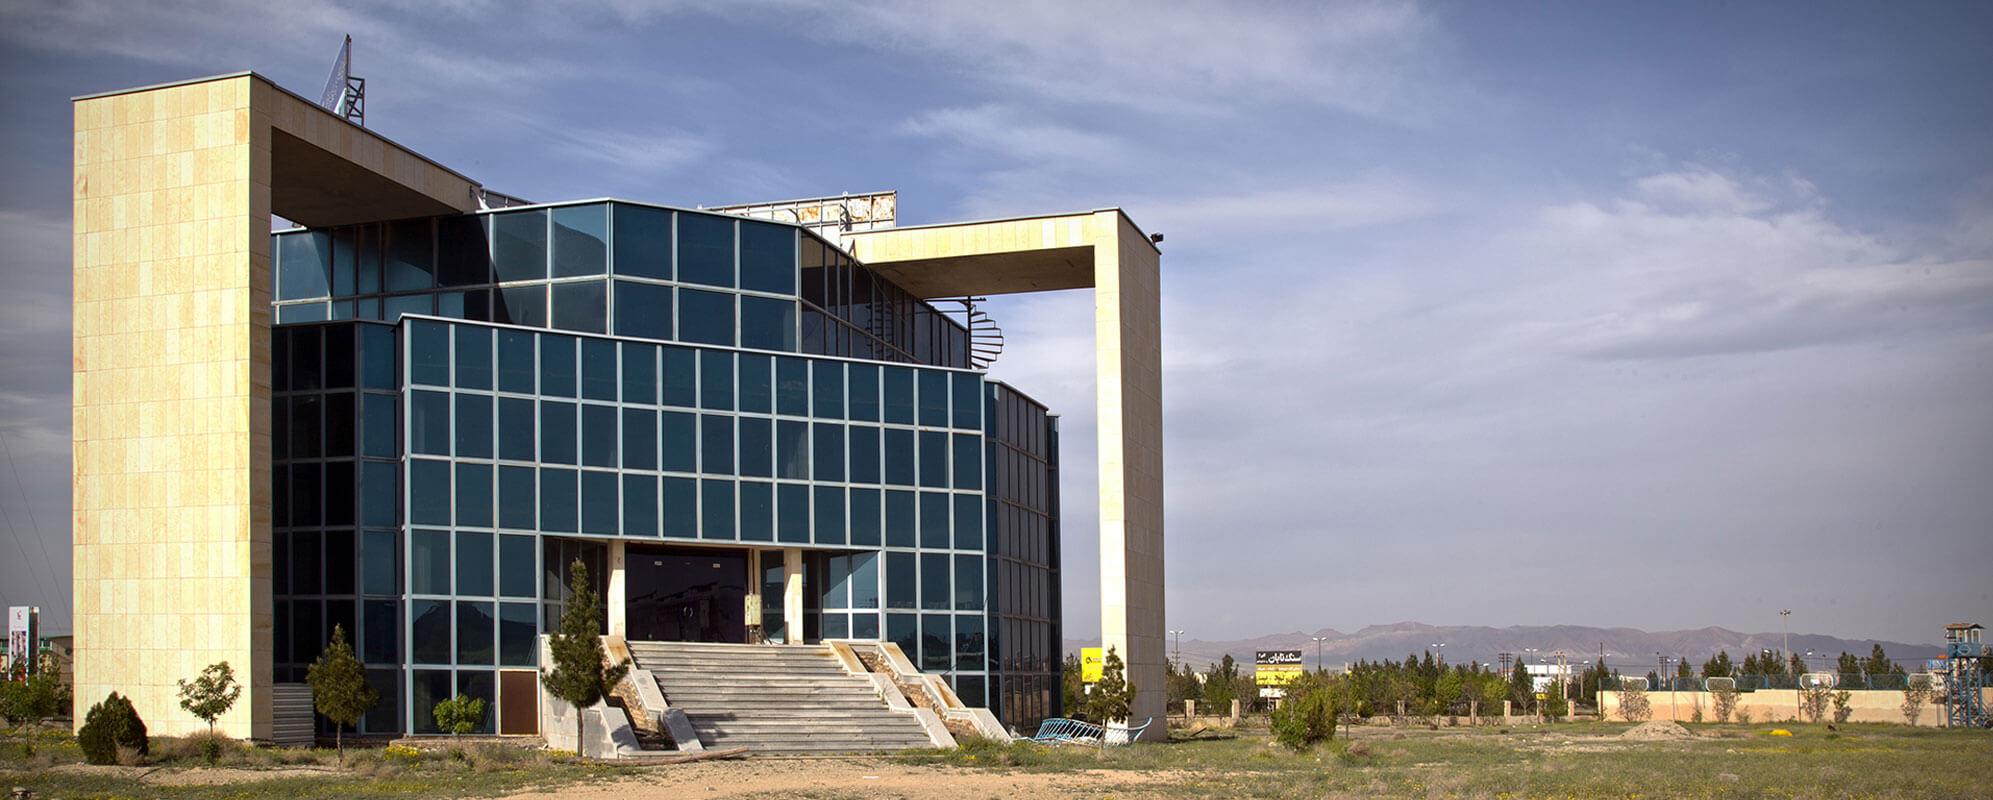 شرکت لوله پروفیل کیهان